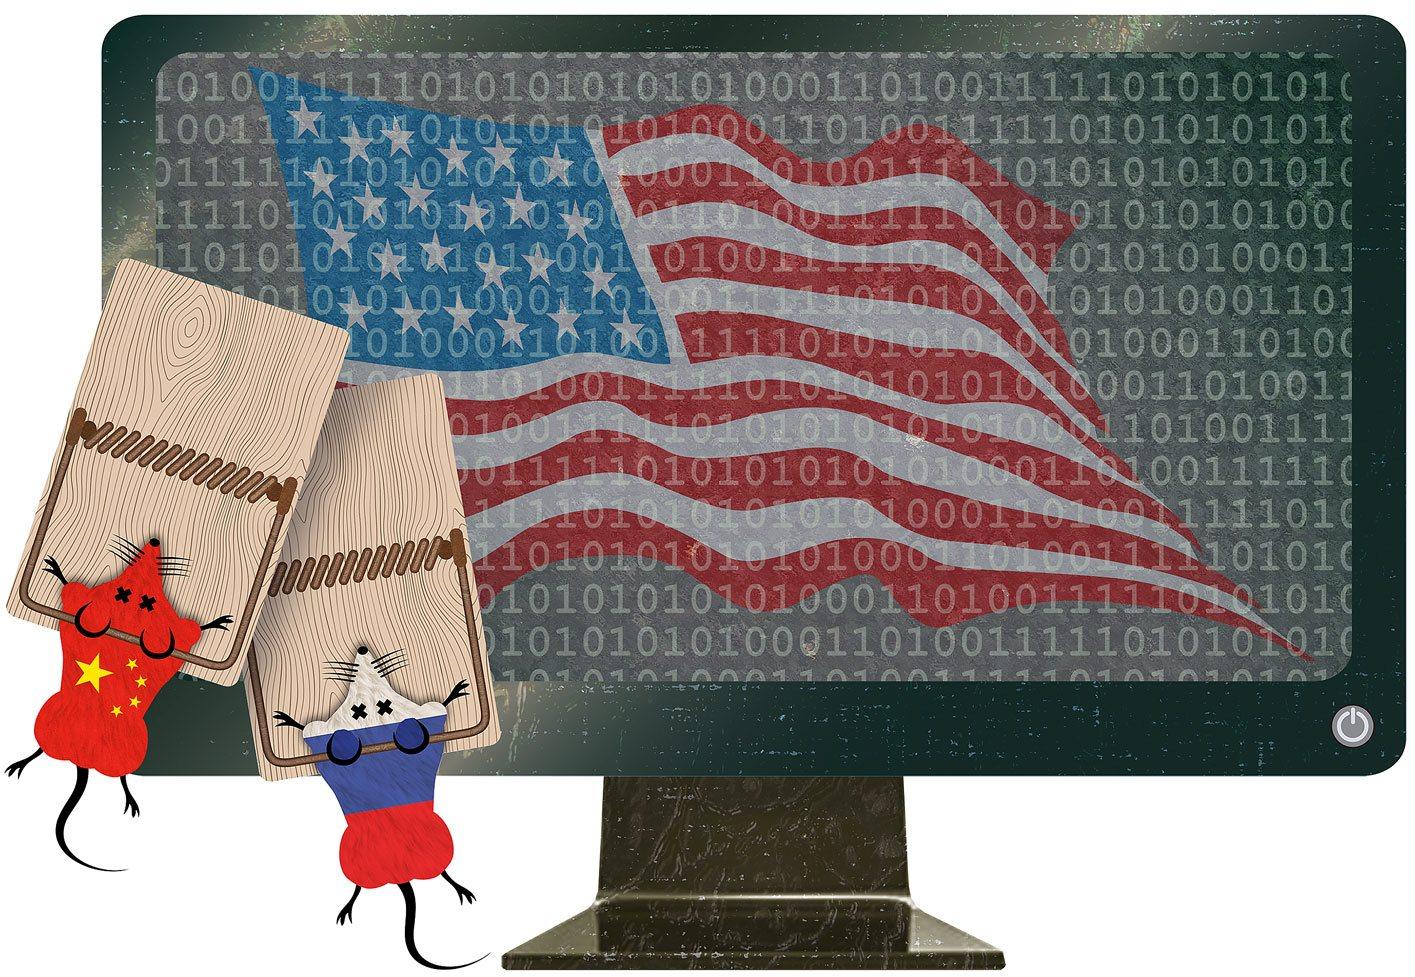 Getting ahead of cyber threats